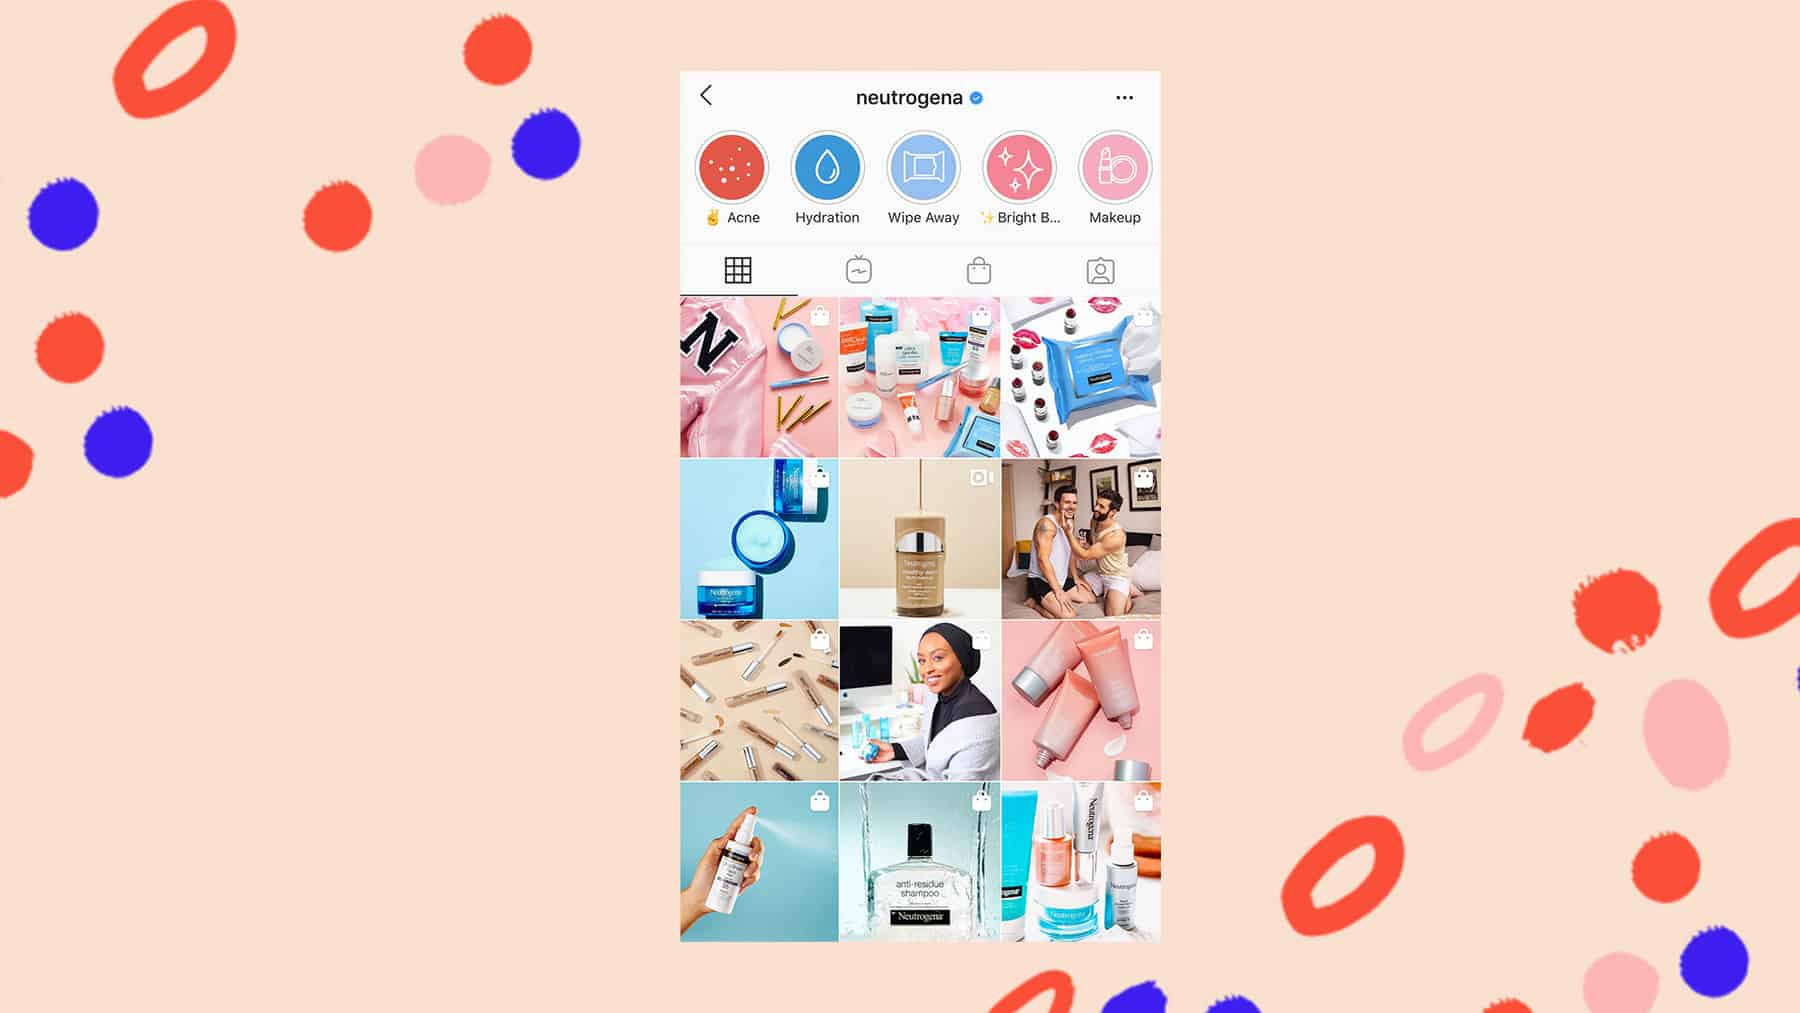 Neutrogena Instagram grid